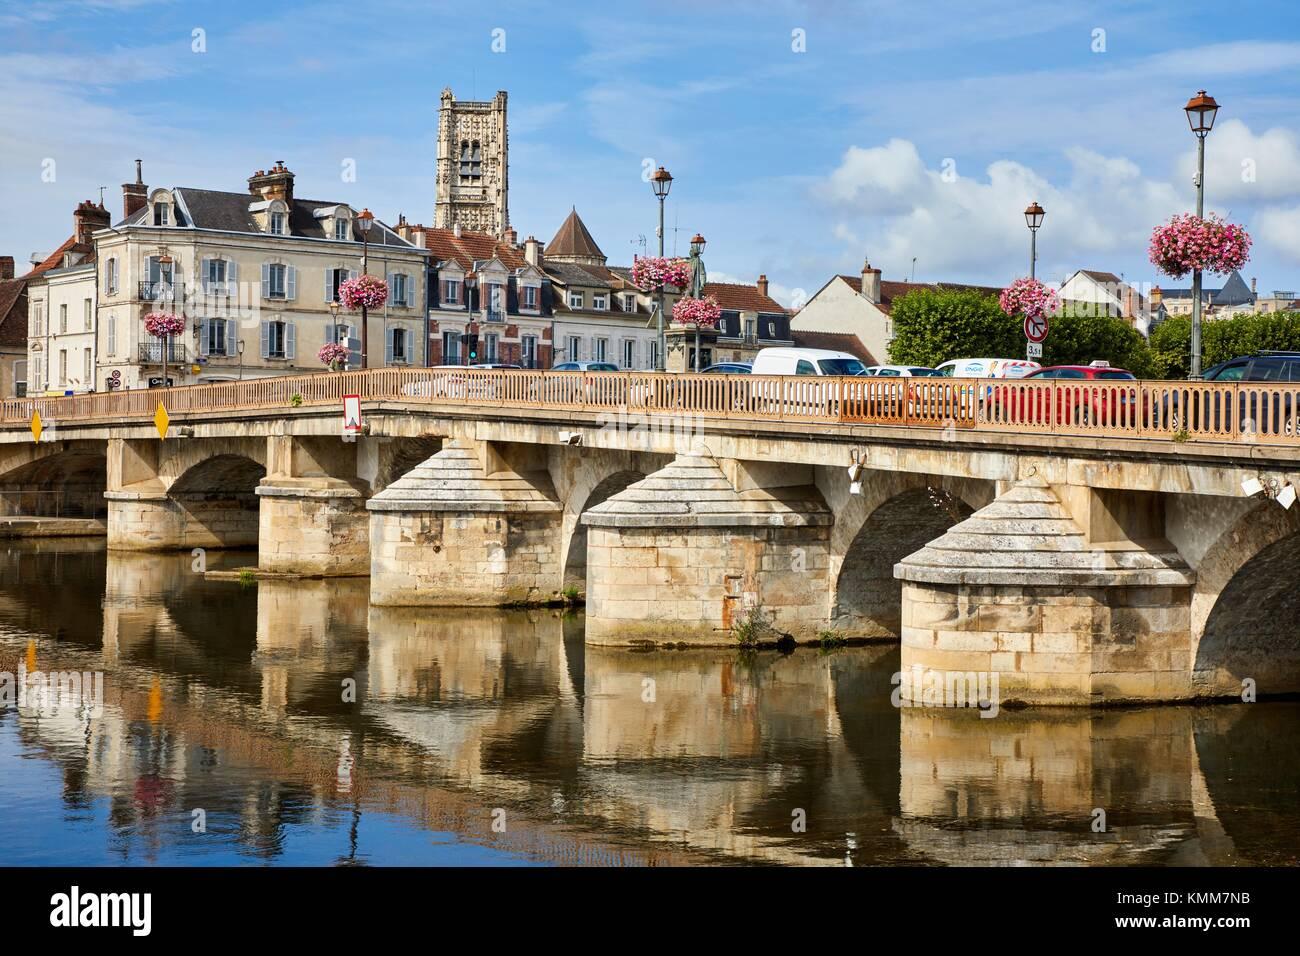 Saint Pierre church, Paul Bert bridge, Yonne river, Auxerre, Yonne, Burgundy, Bourgogne, France, Europe - Stock Image